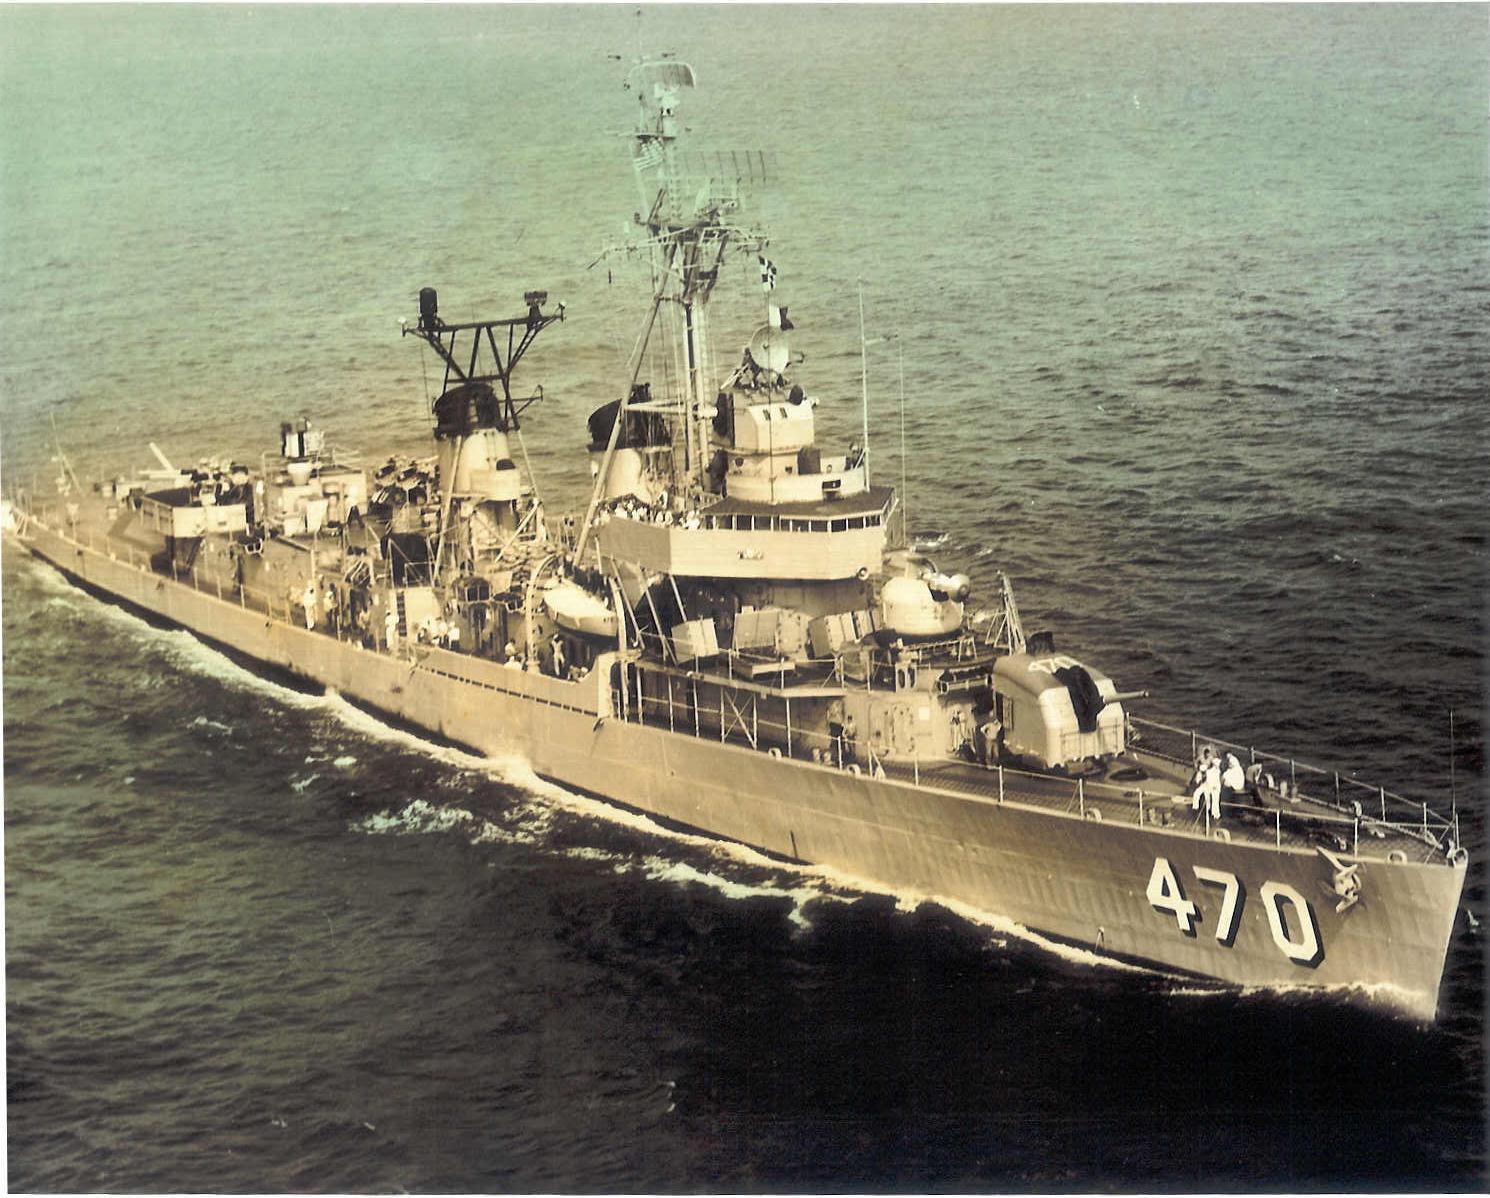 USS Bache at sea